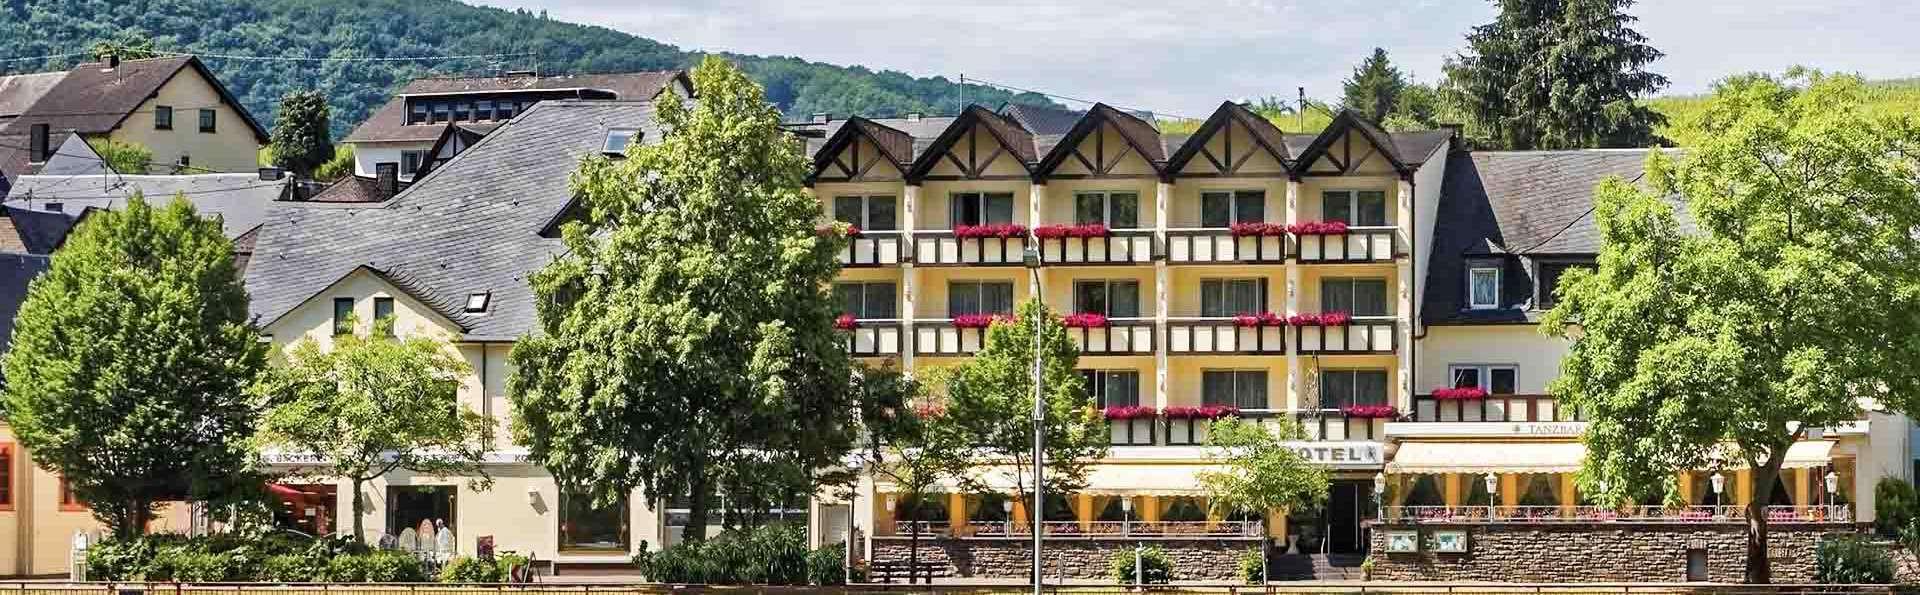 "Moselstern***Hotel ""Weinhaus Fuhrmann"" - EDIT_Moselstern_Weinhaus_Fuhrmann_01.jpg"